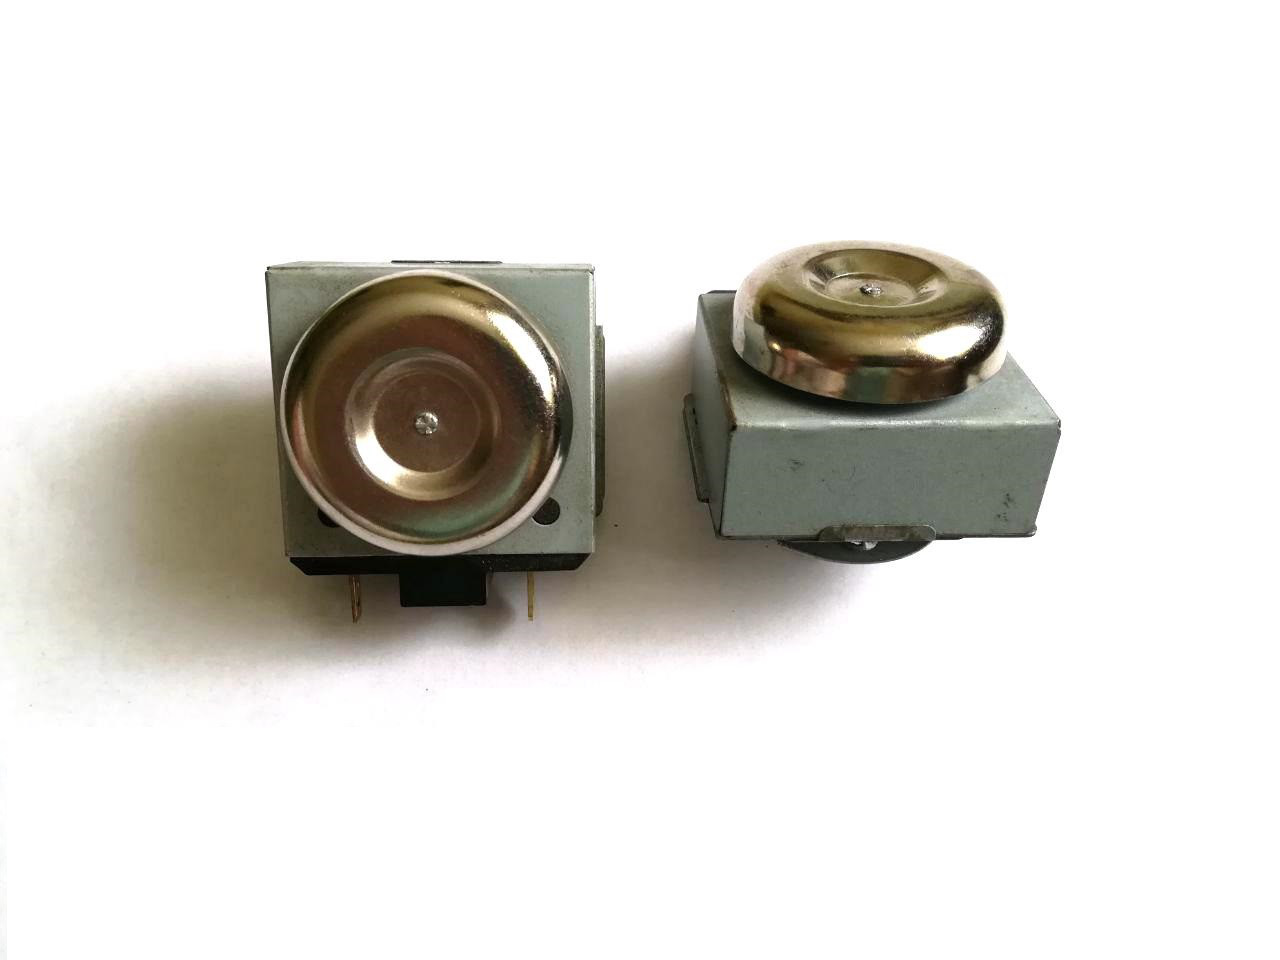 Таймер механический 16A / Tmax=120 с коротким стержнем / 250V